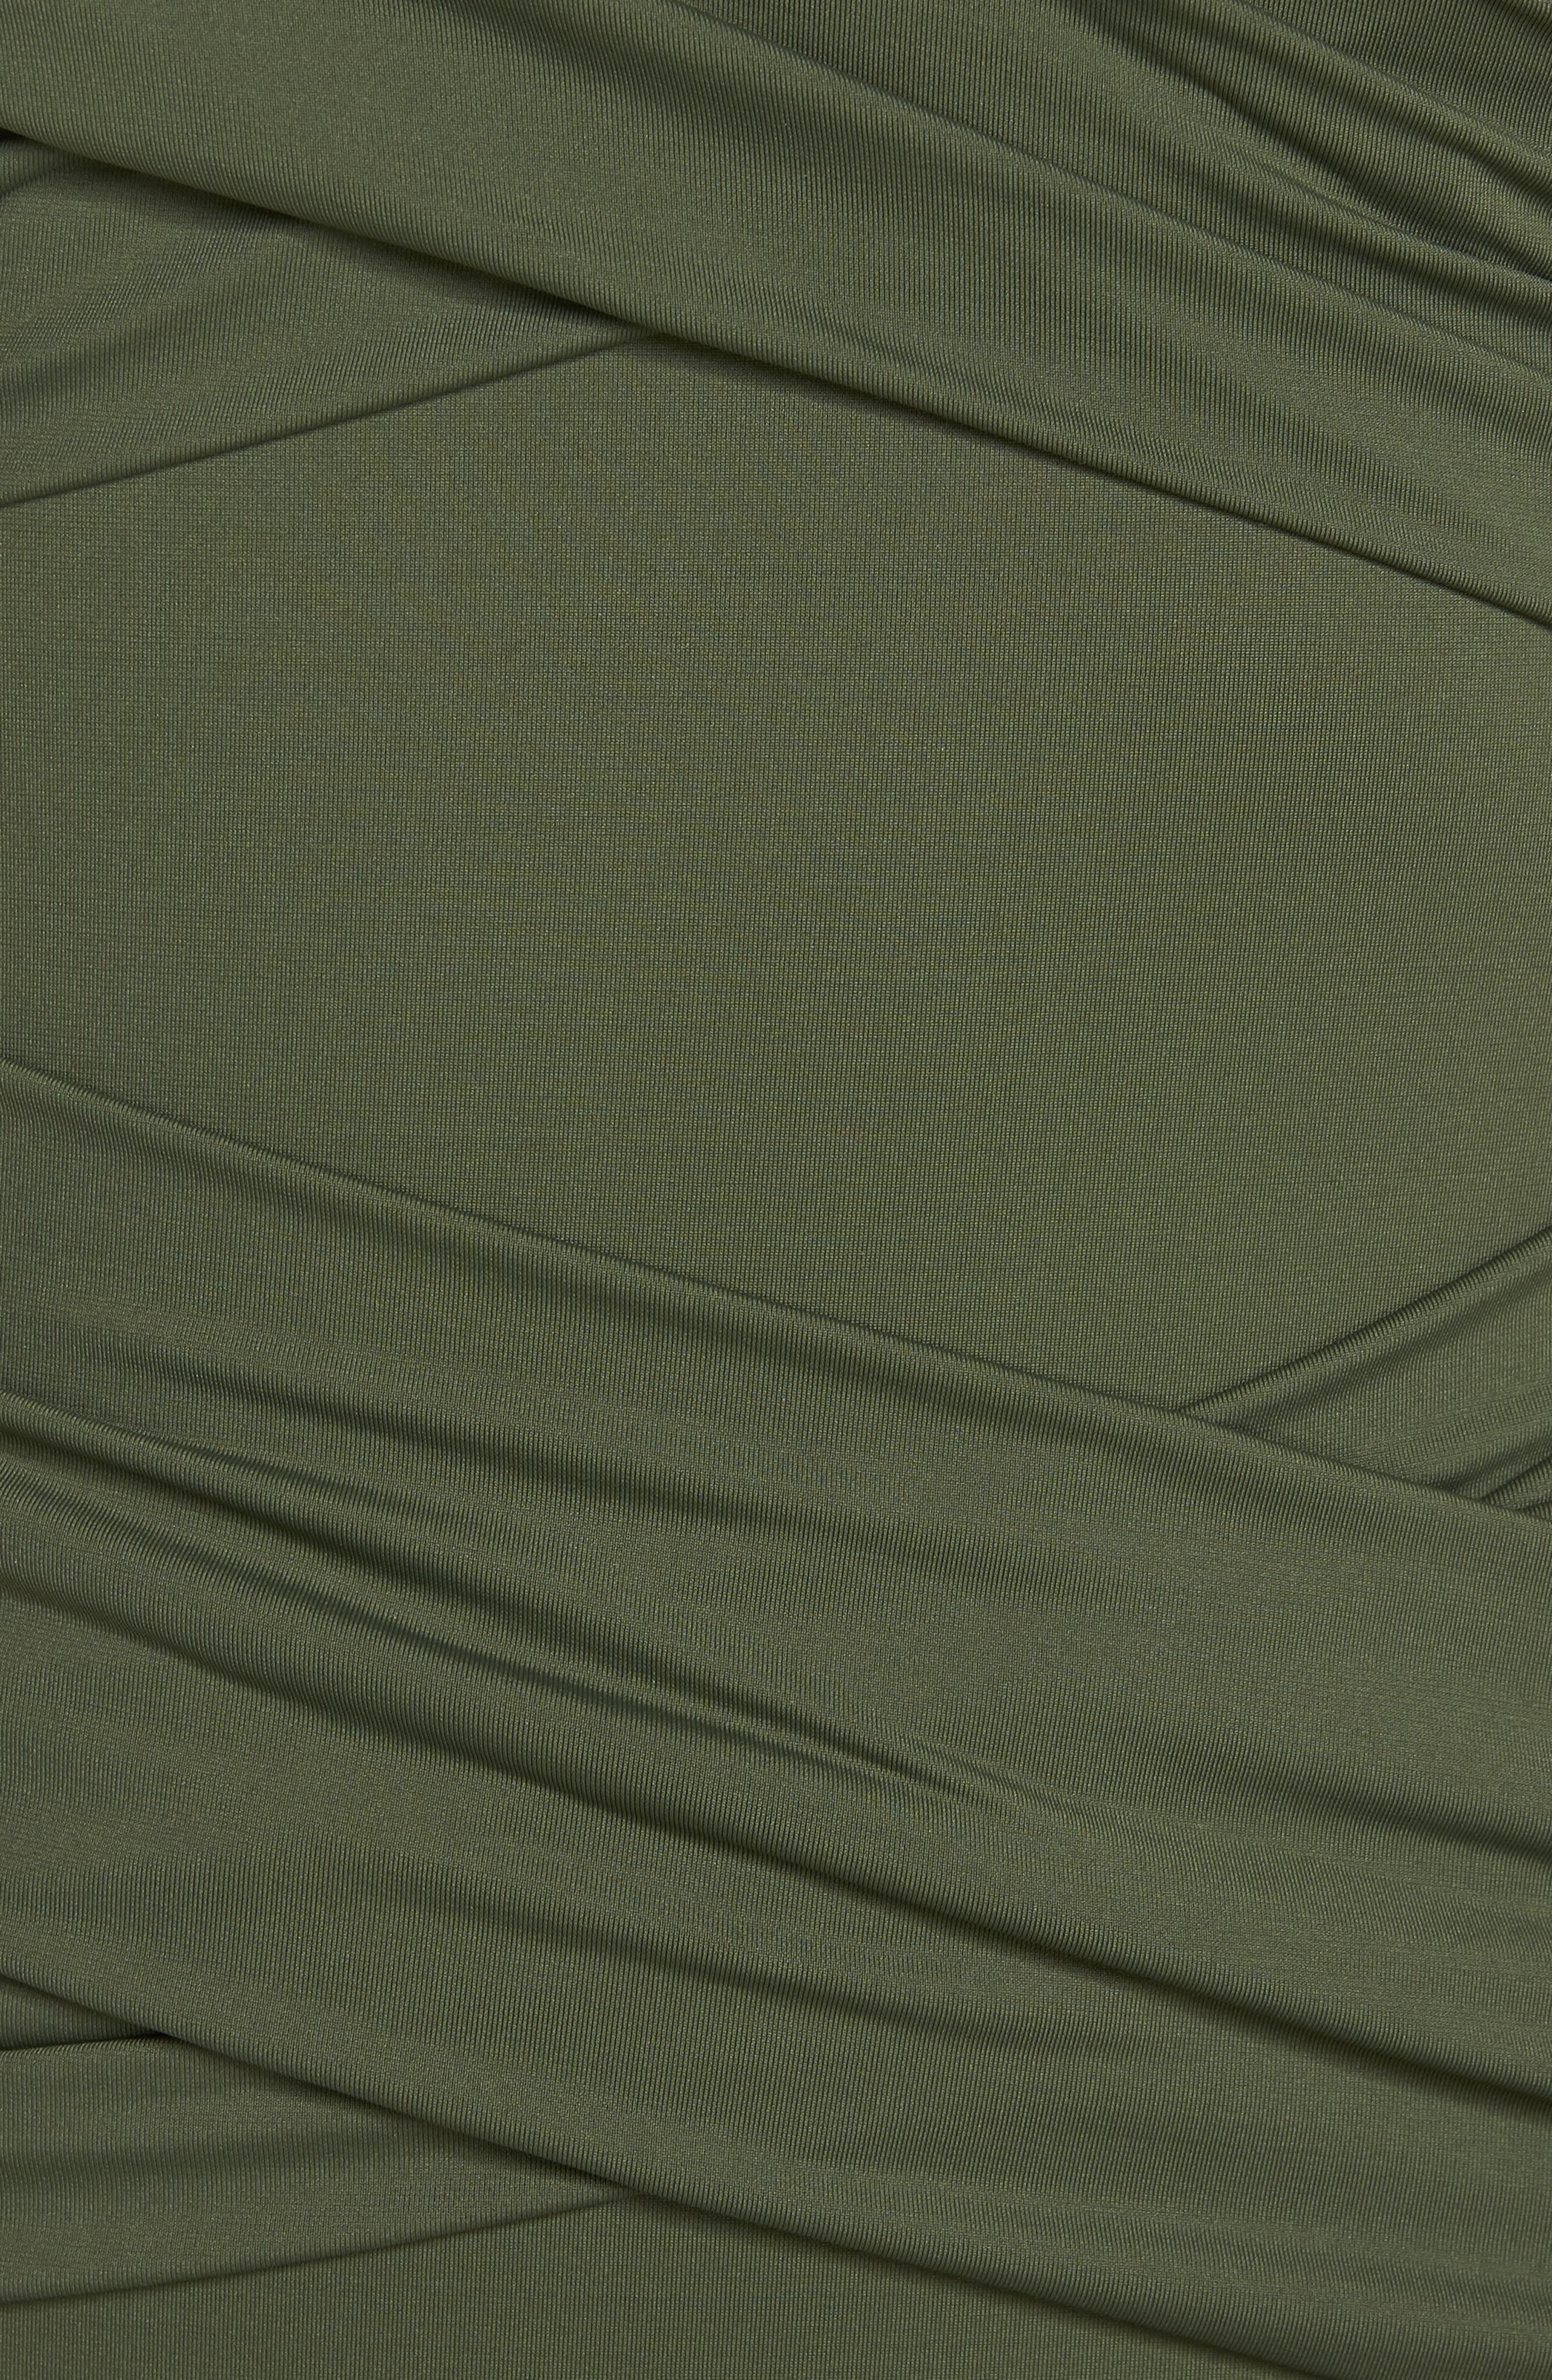 Pearl One-Piece Swimsuit,                             Alternate thumbnail 5, color,                             Dark Tea Leaf